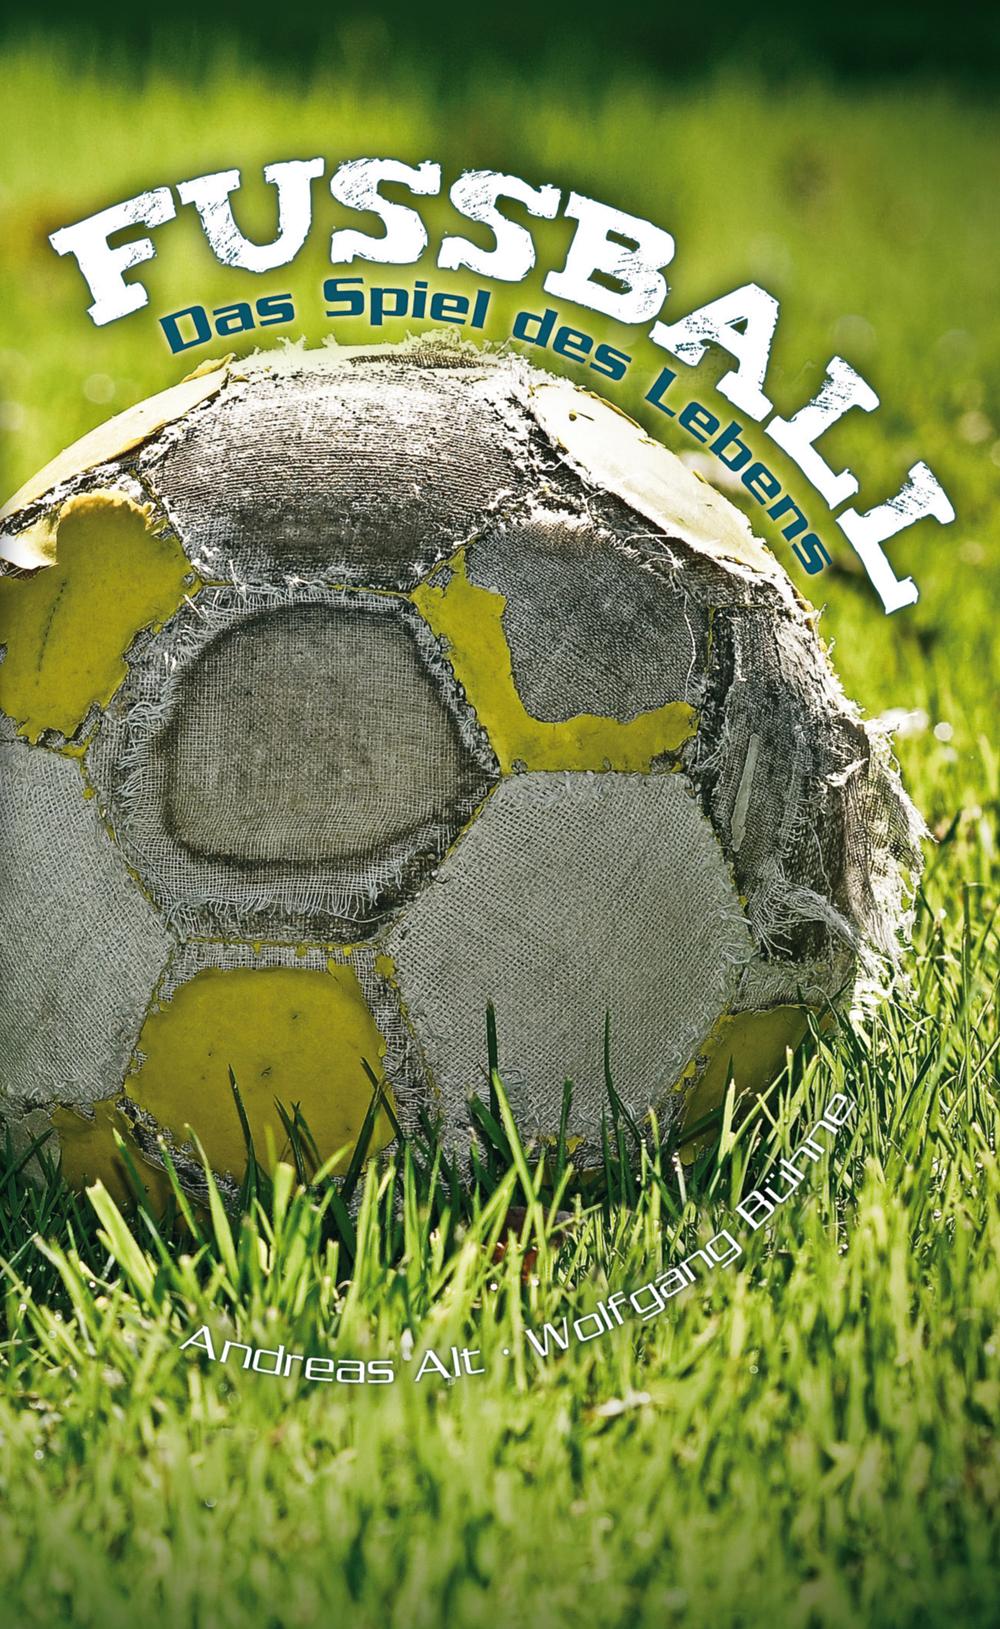 CLV_fussball-das-spiel-des-lebens_wolfgang-buehne-andreas-alt_255555_1